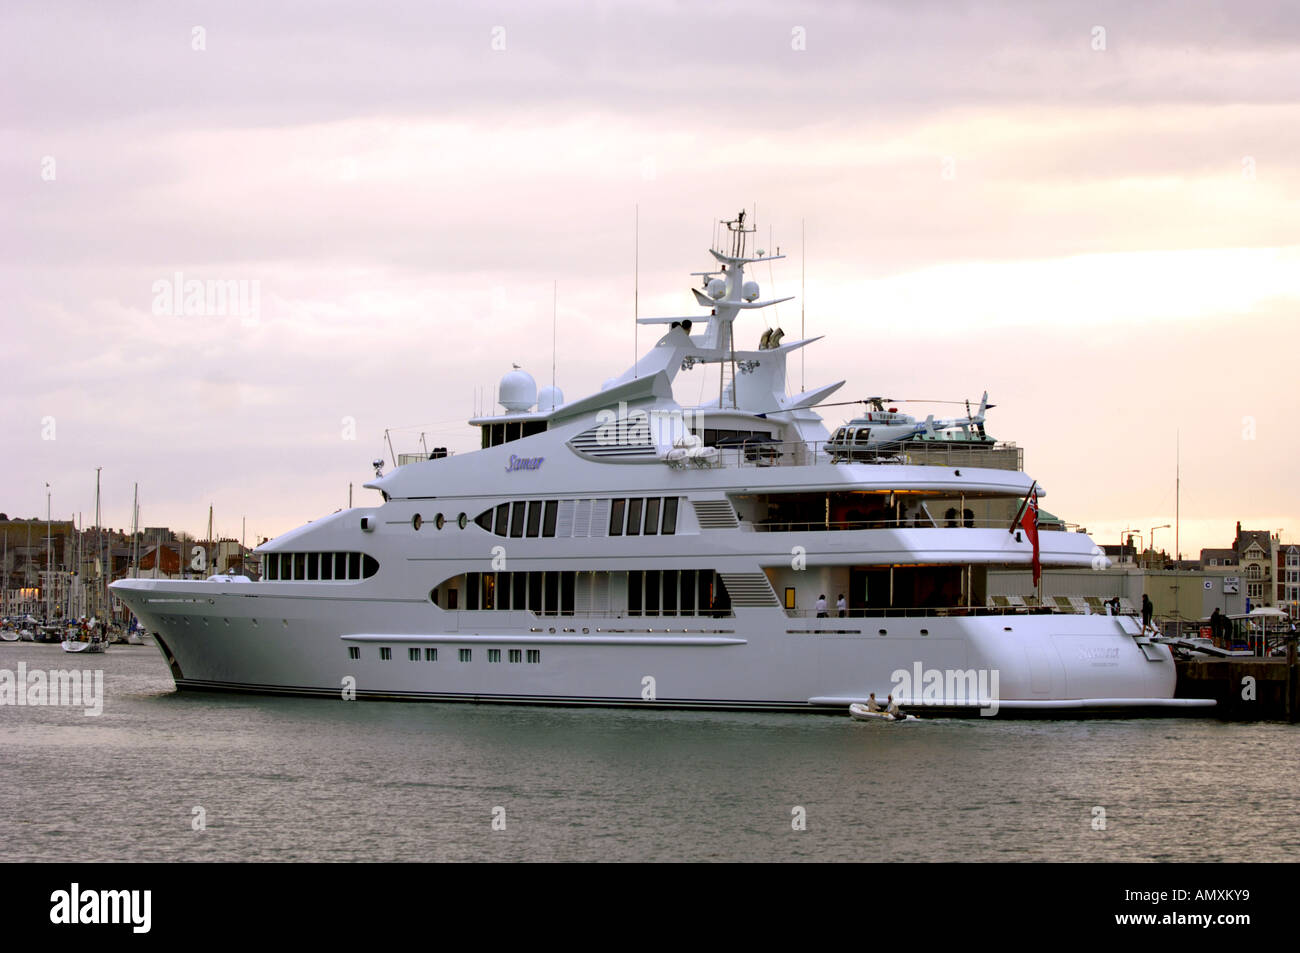 Samar, super yacht at dock in Weymouth Harbour, Dorset UK - Stock Image